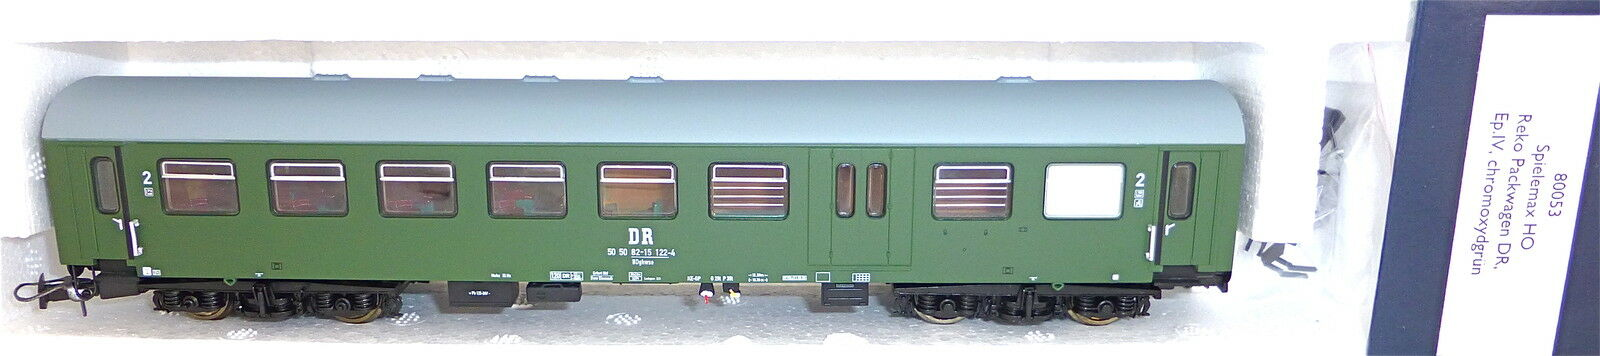 Reko Pack carro chromoxydgruen Dr ep4 Heris 80053 h0 1 87 nuevo embalaje original b2b2 µg